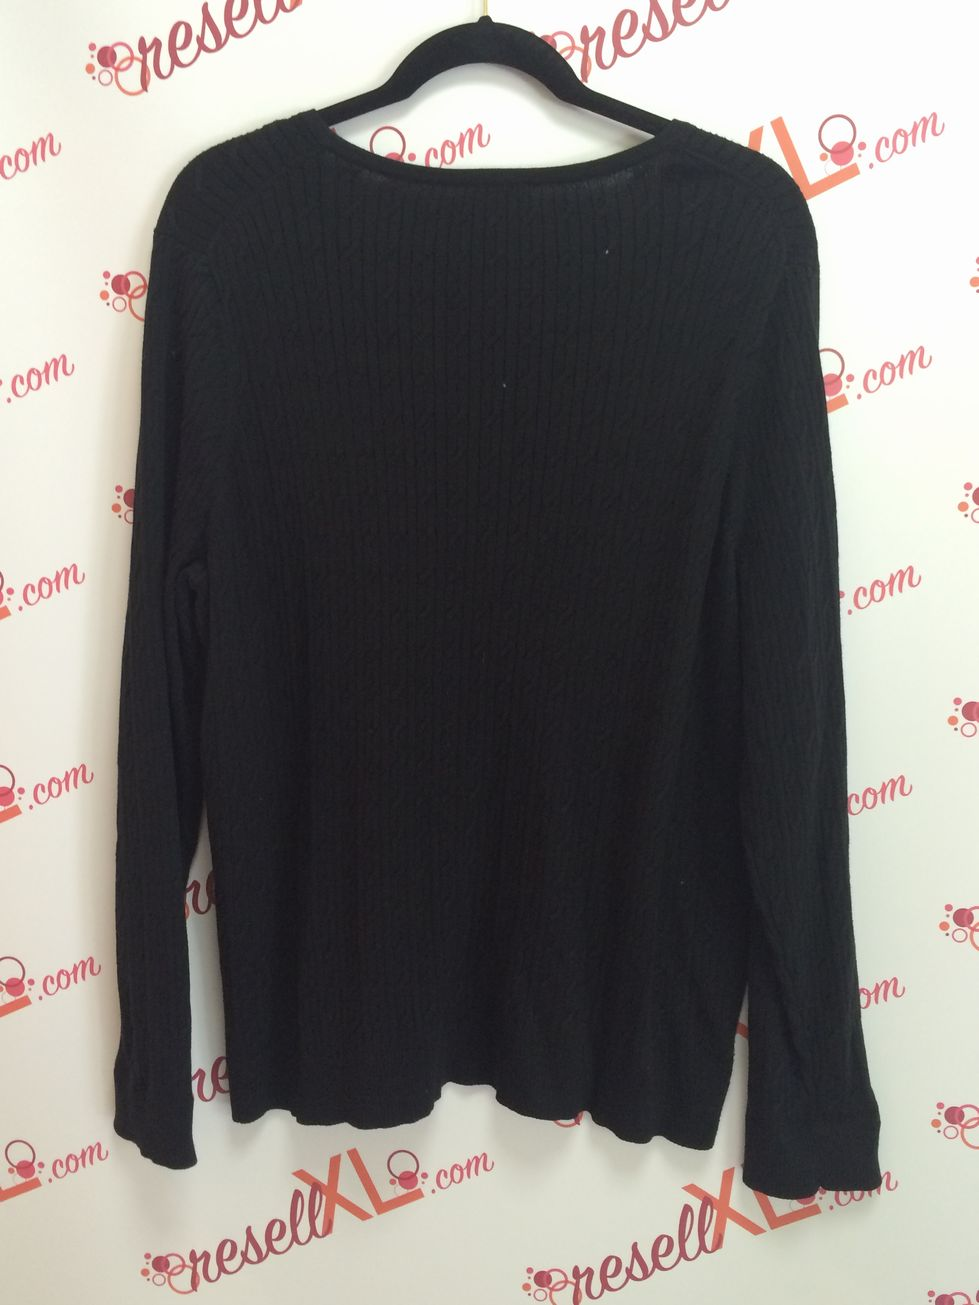 Talbots-Size-2X-Black-Pima-V-neck-Cable-Knit-Shirt_2991B.jpg